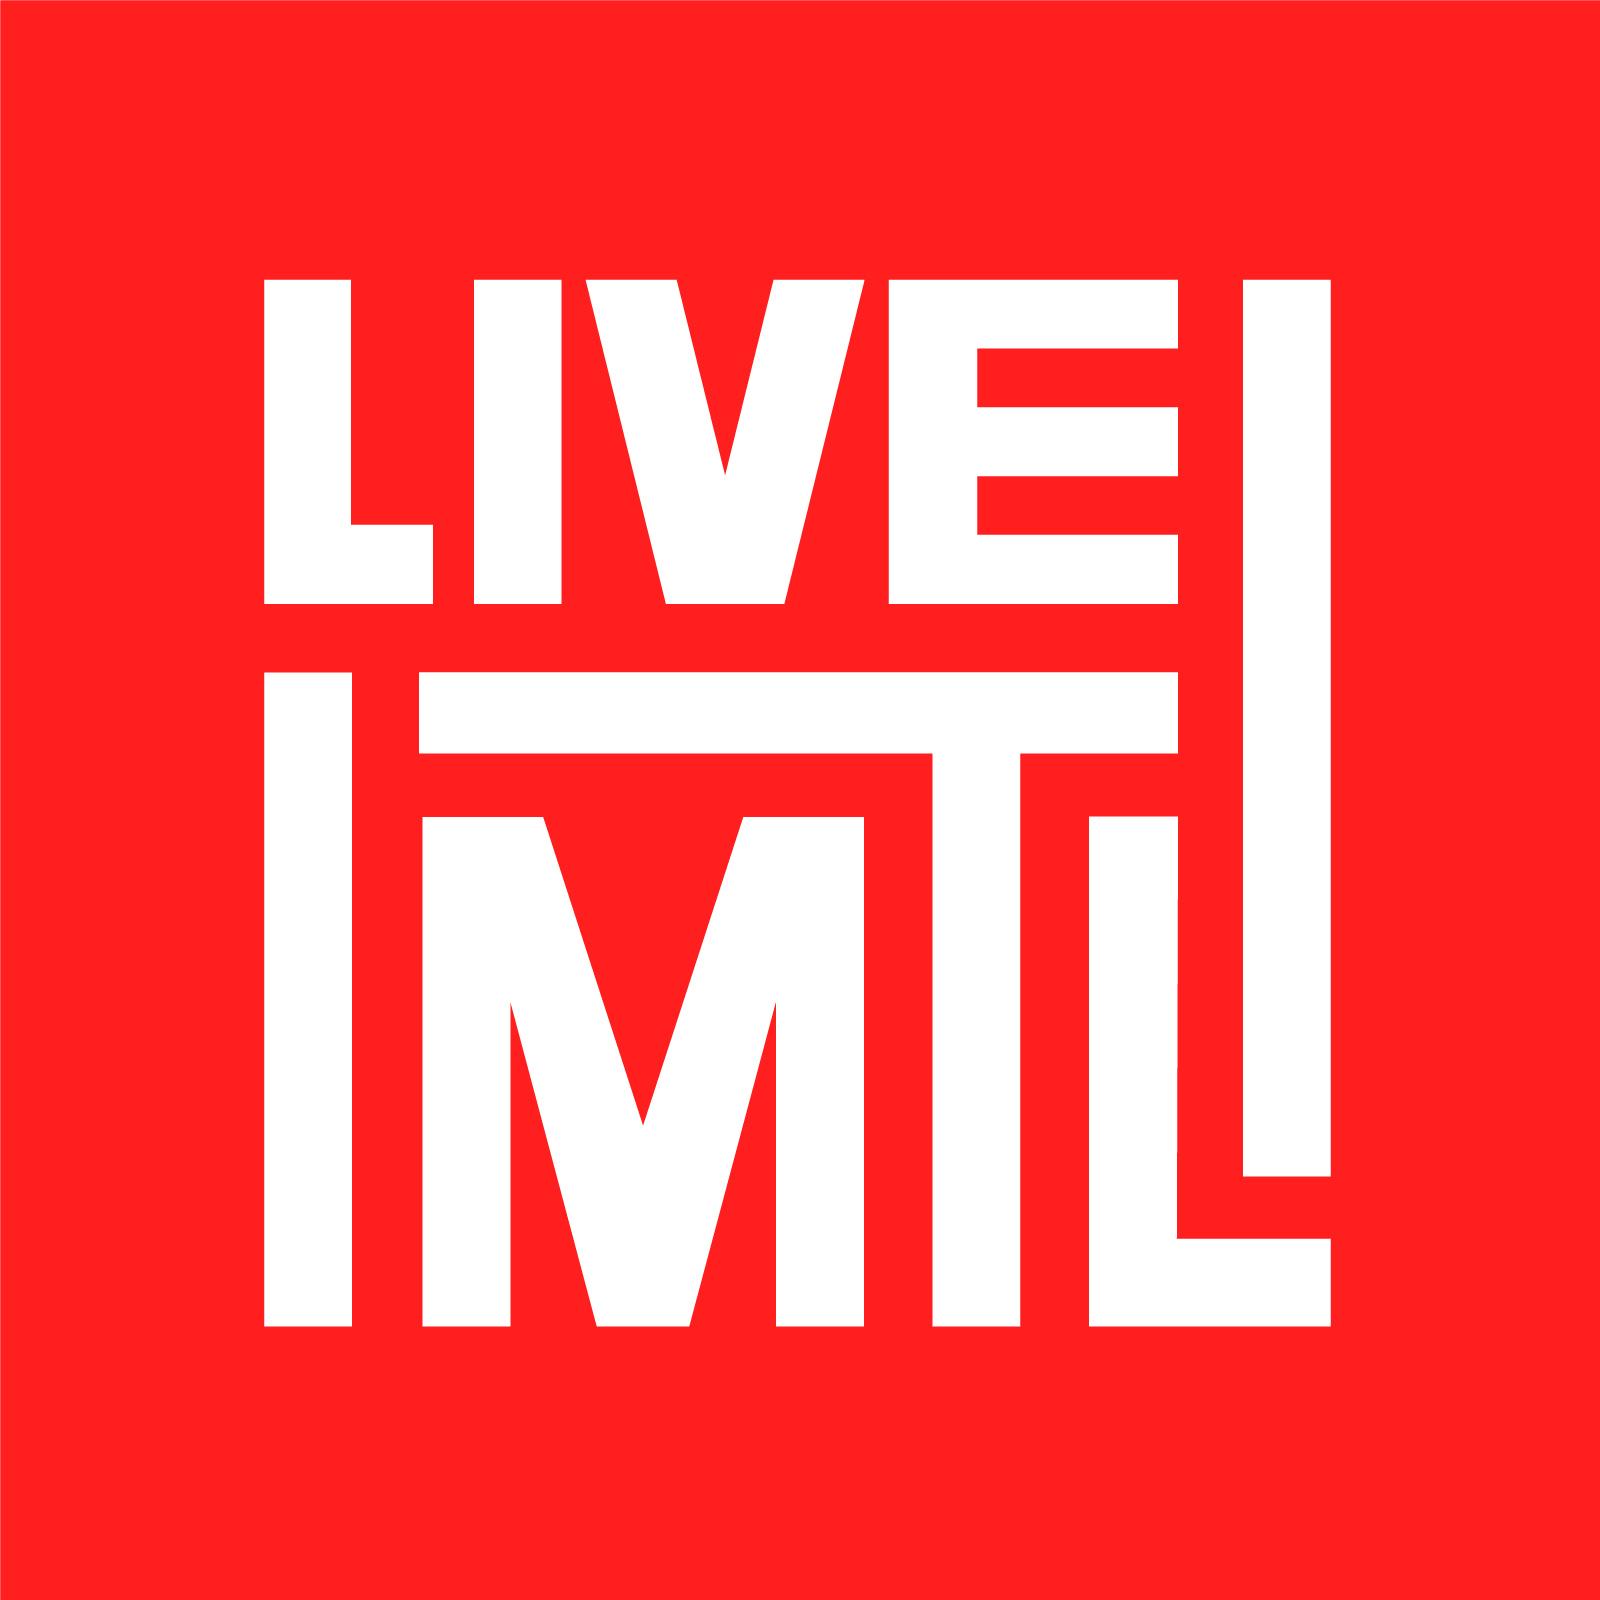 LiveMTL